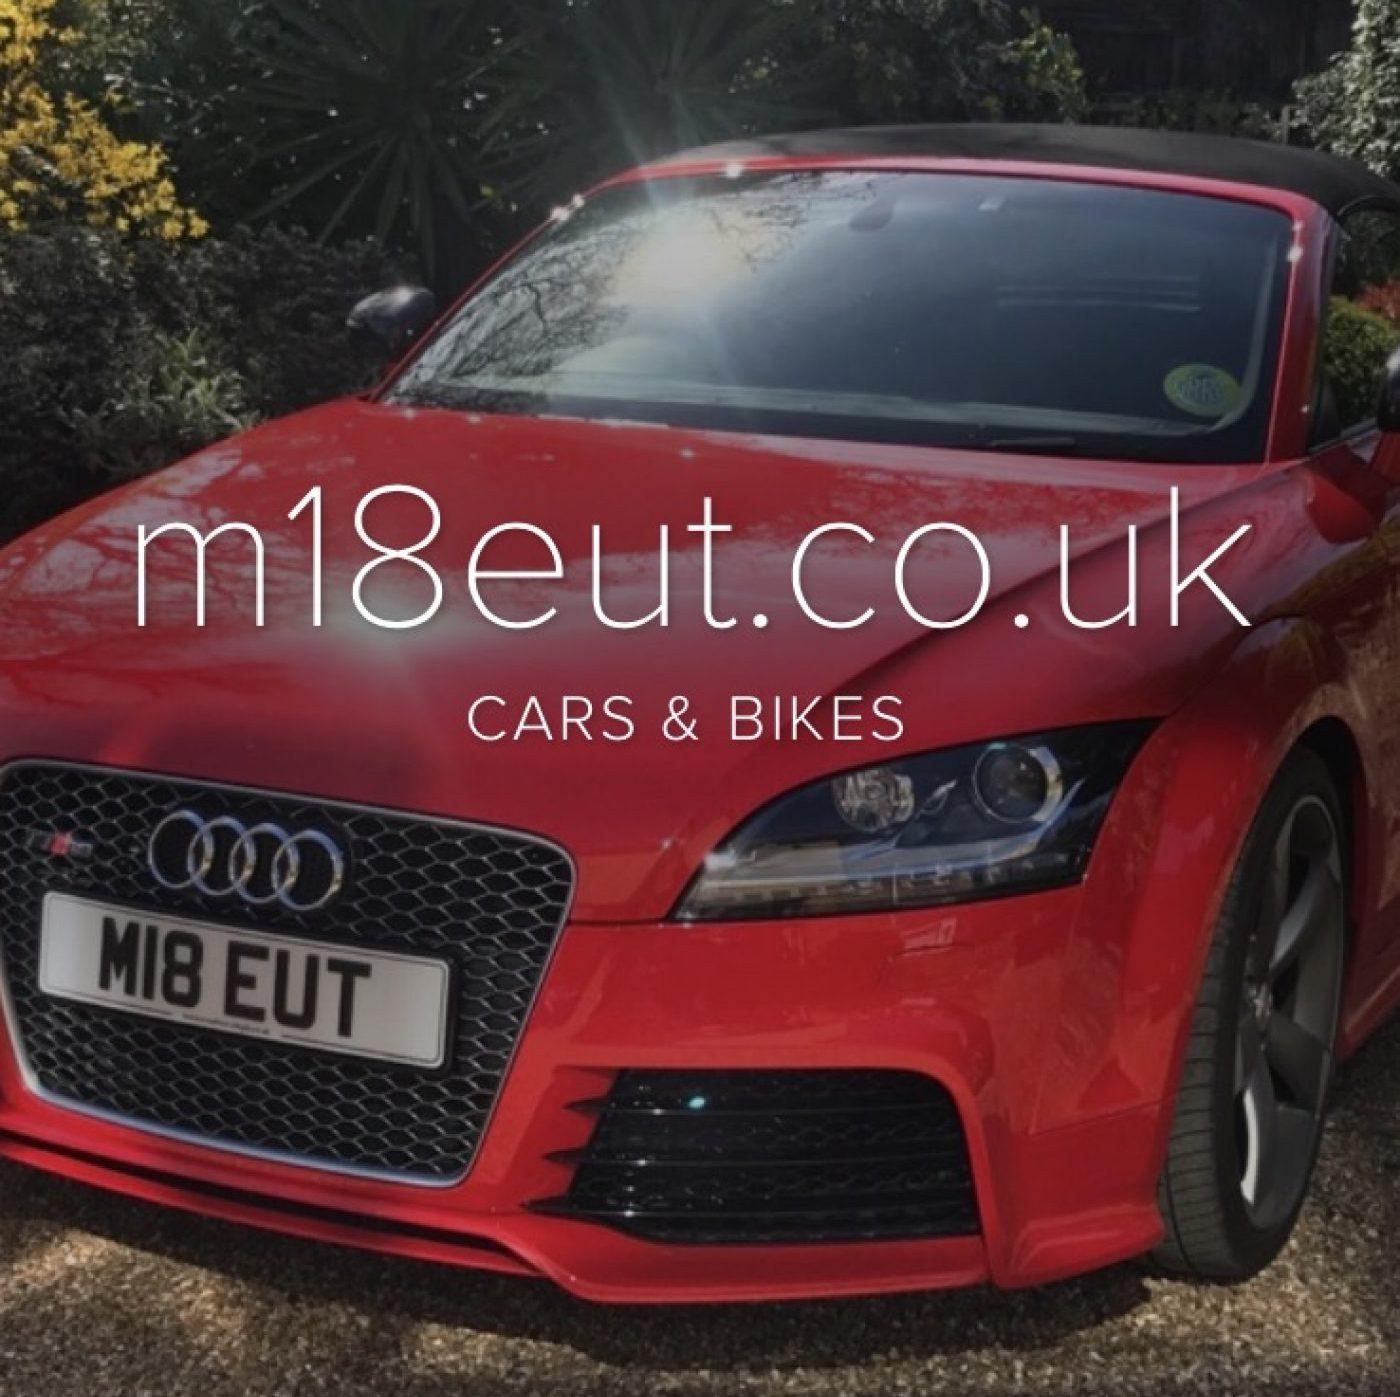 Geoff's car site, M18EUT